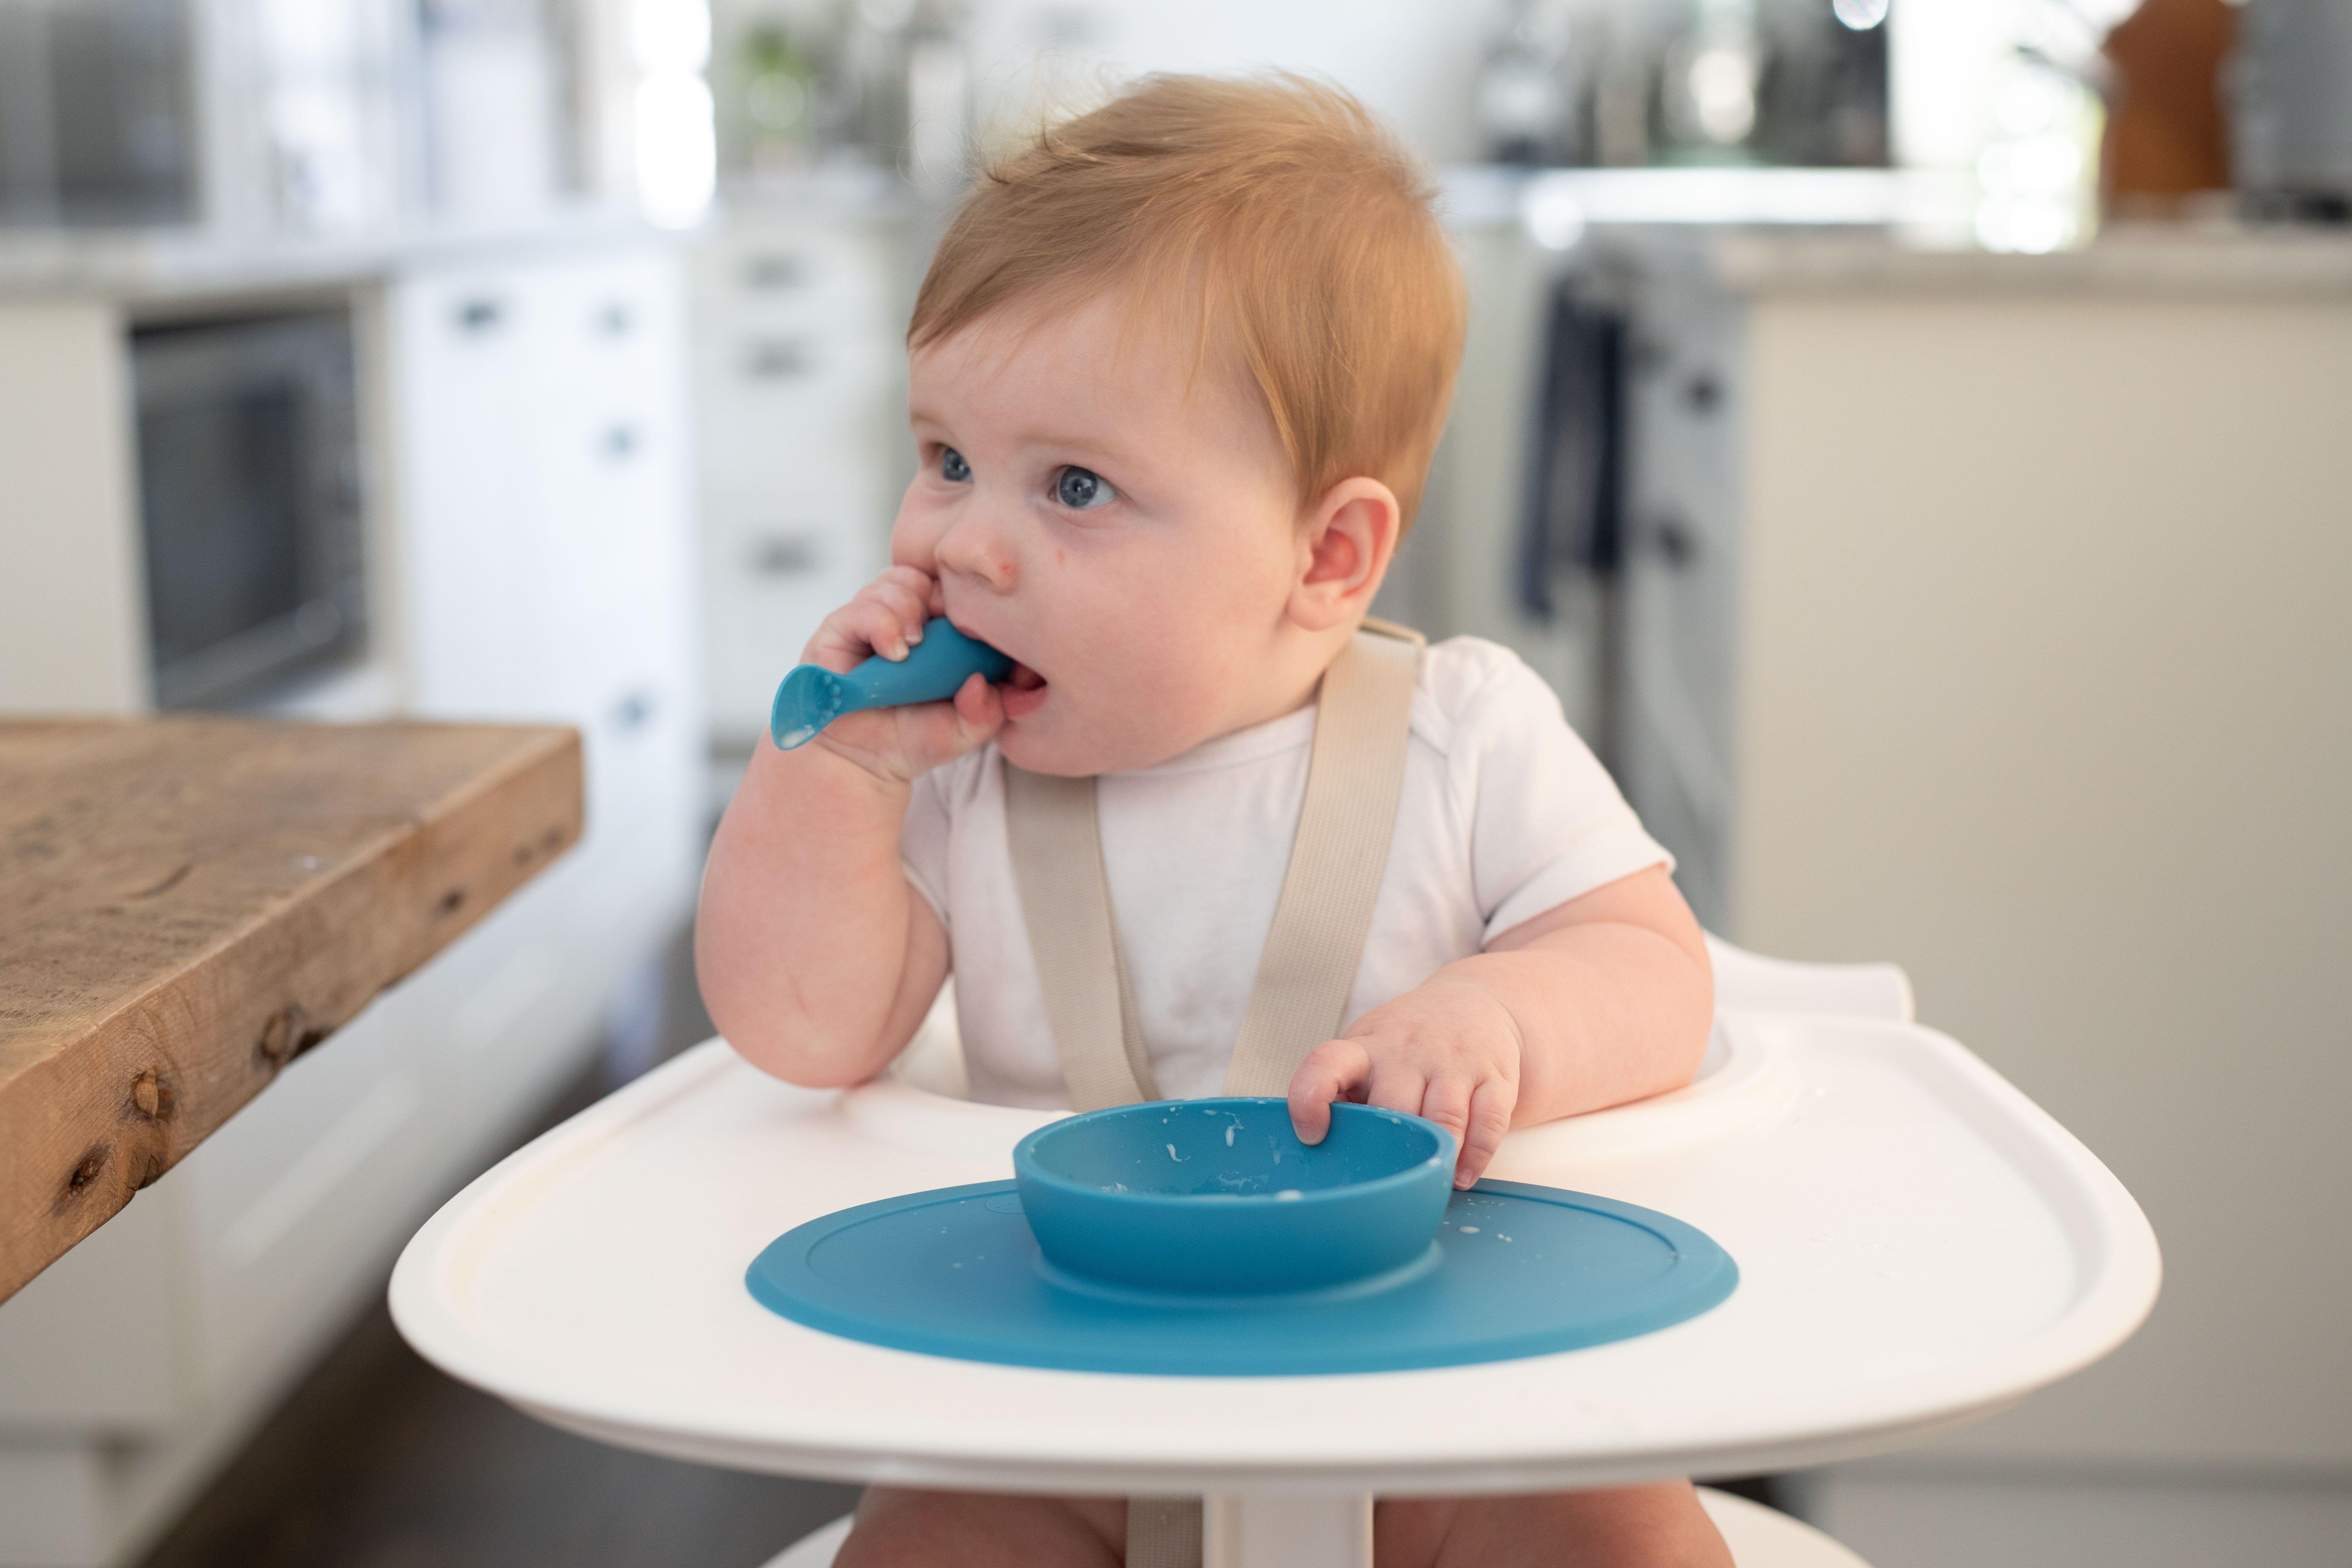 957f500ea99592cb355e0049ea0025eb - How To Get Baby To Eat From A Spoon